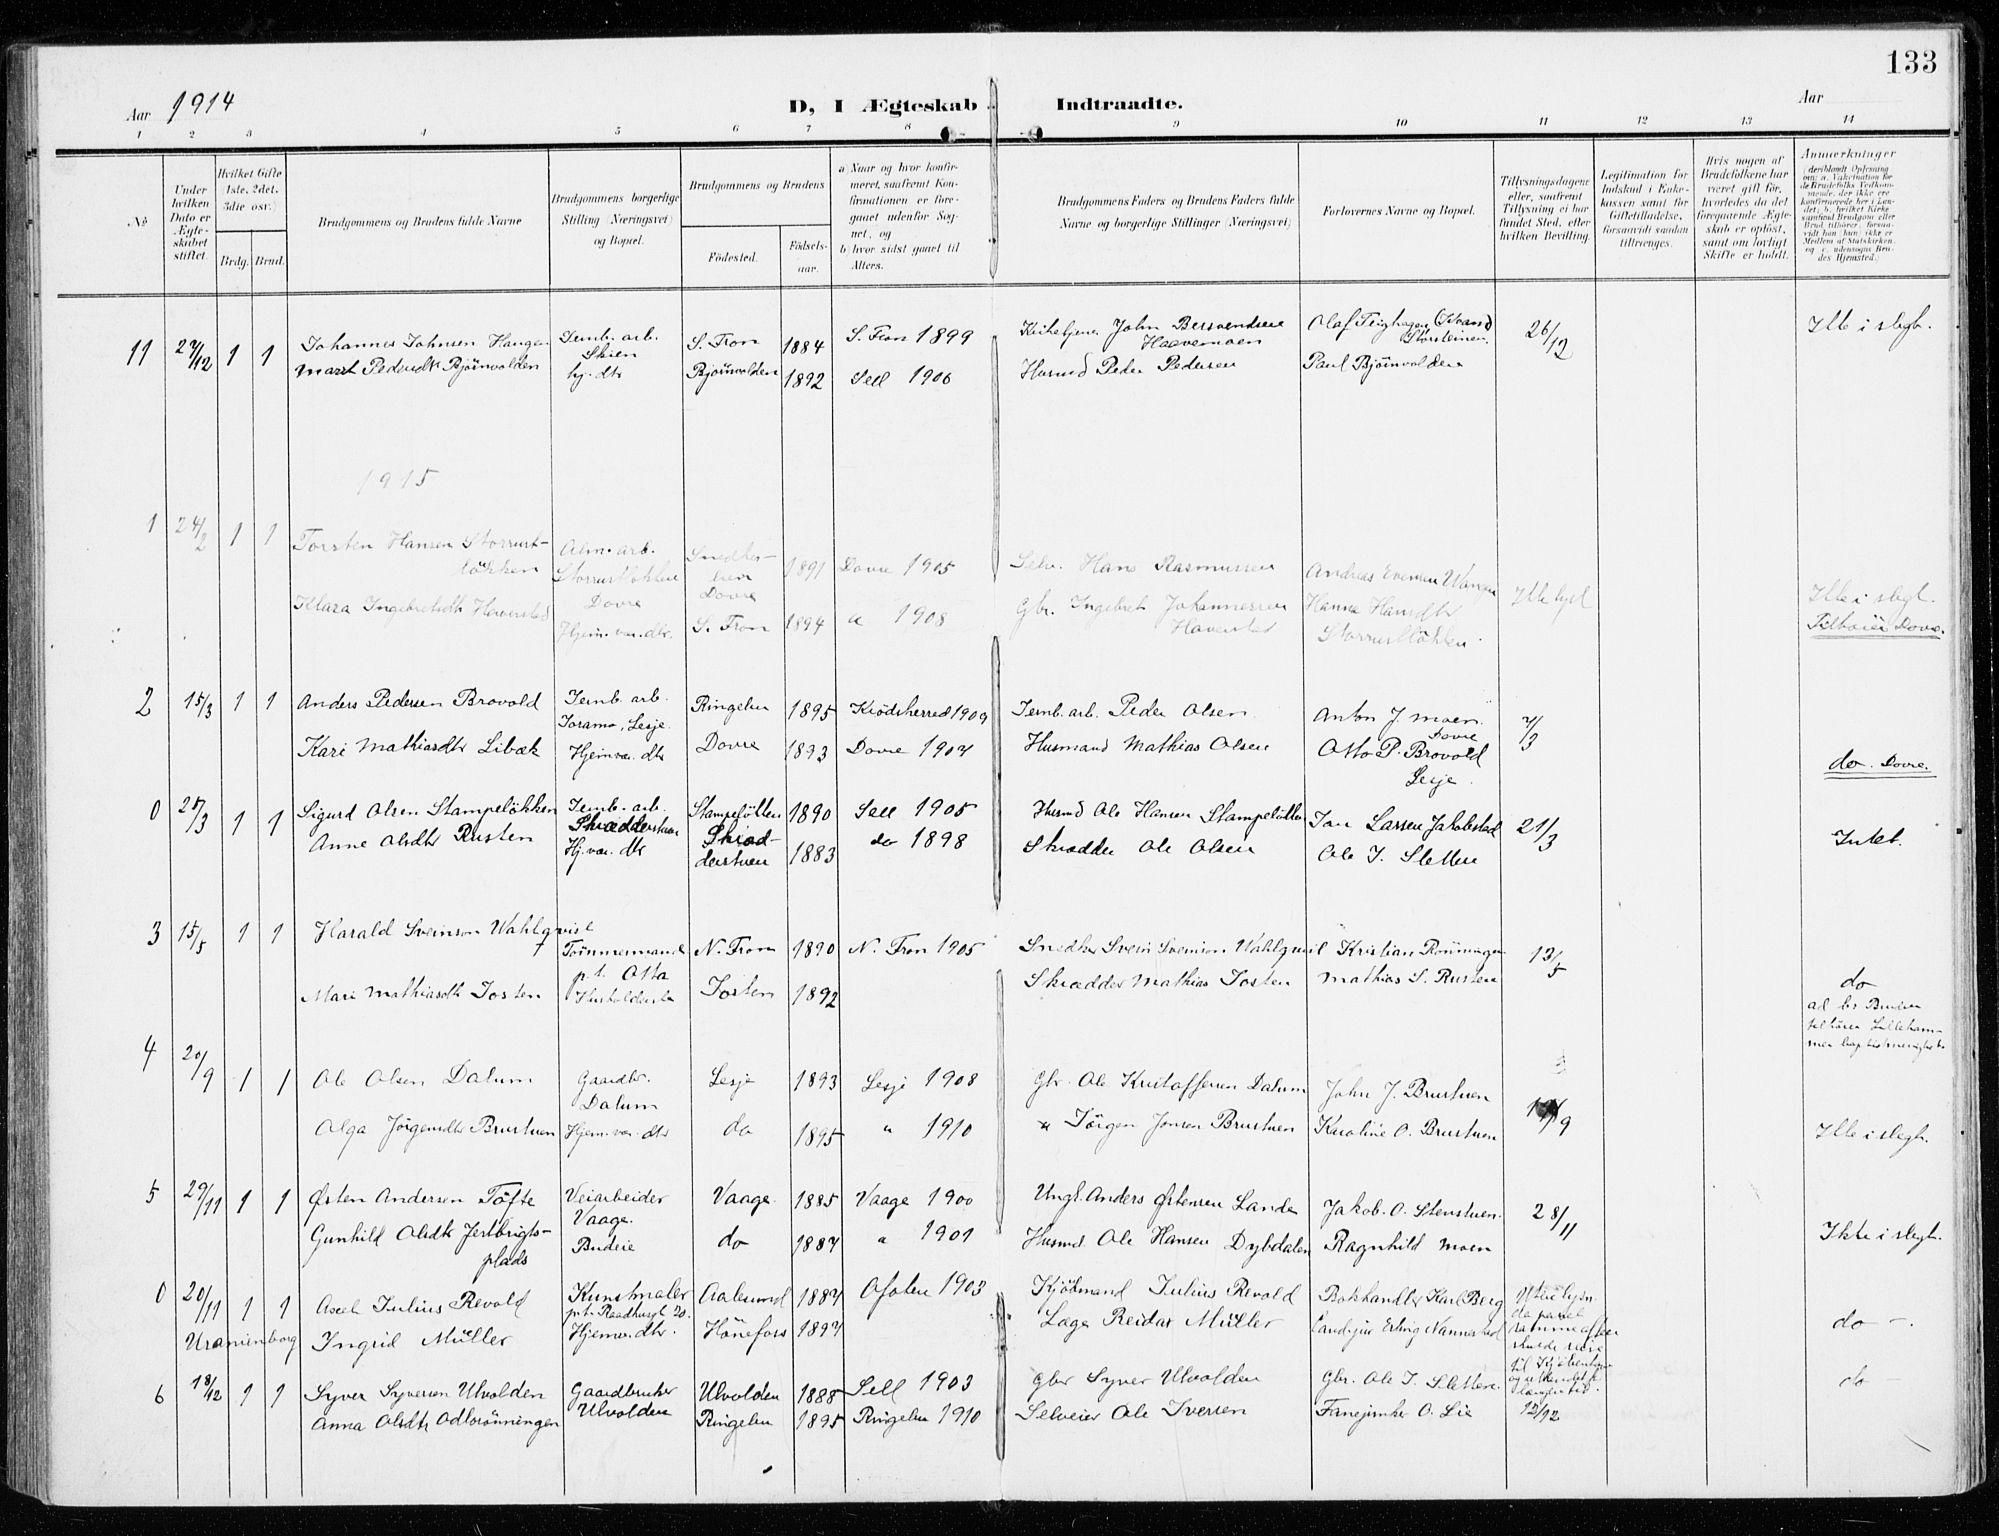 SAH, Sel prestekontor, Ministerialbok nr. 2, 1905-1919, s. 133